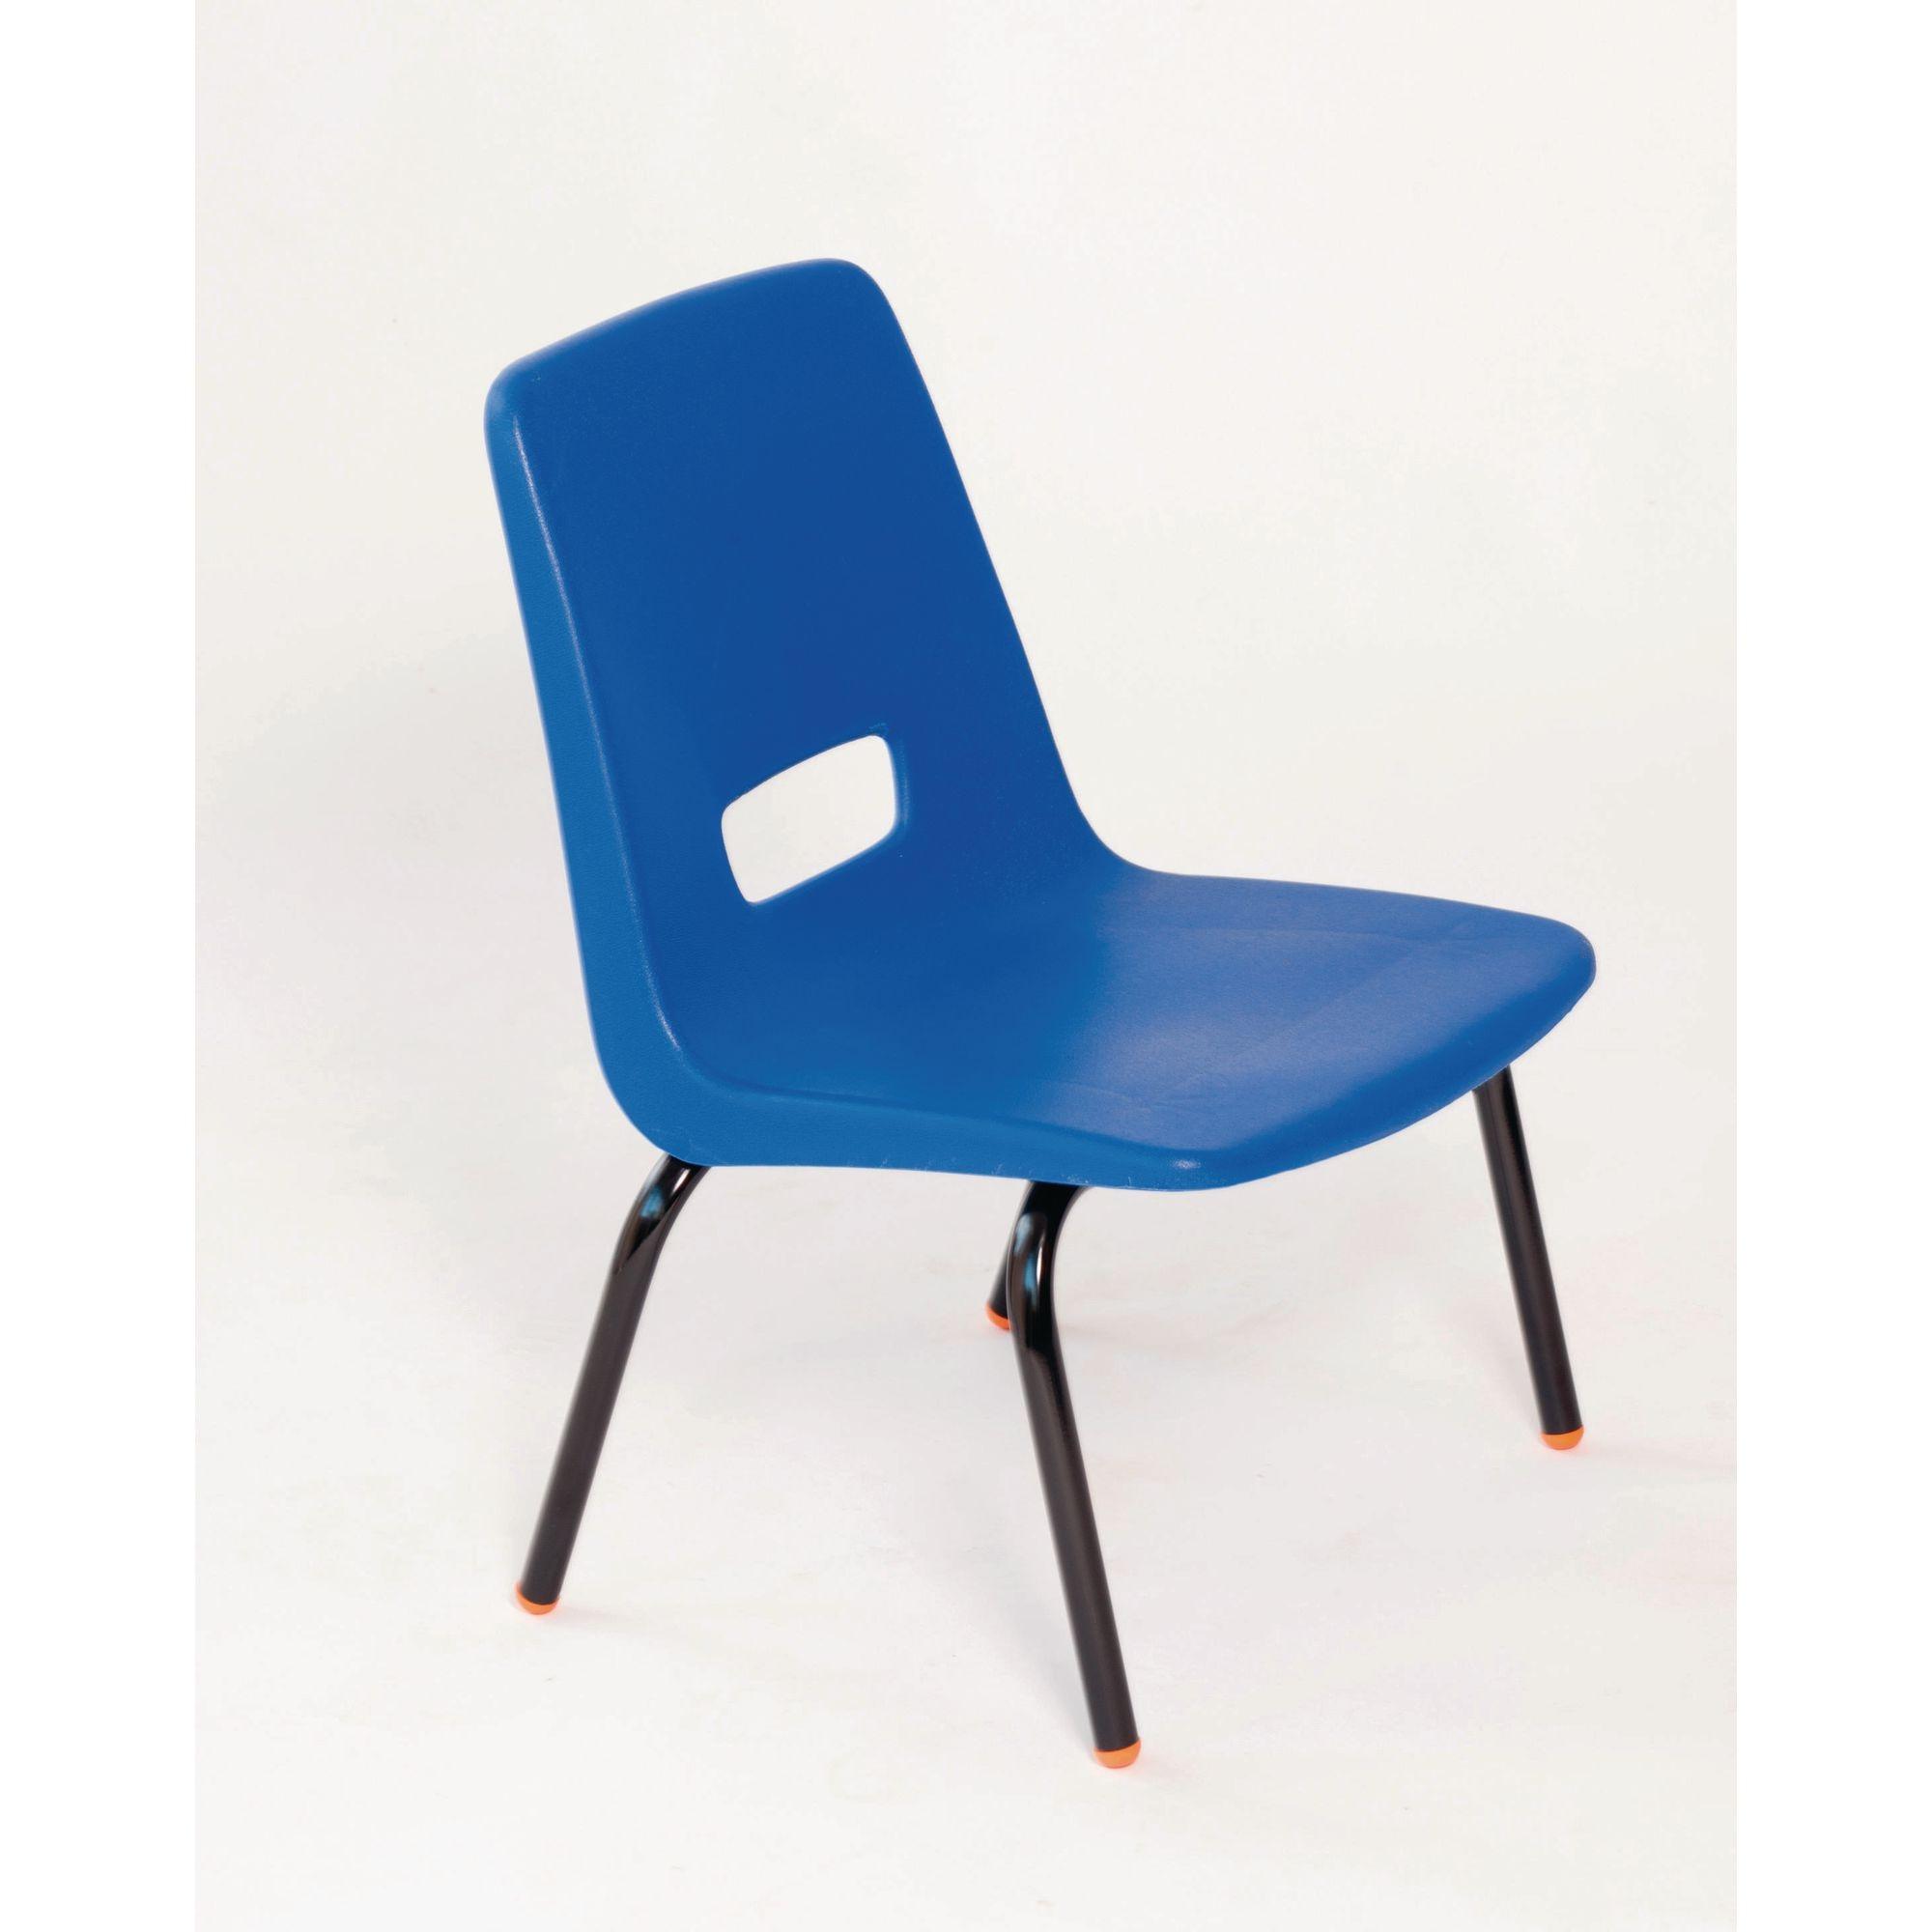 P3 Chair 380mm Black Frame Brown